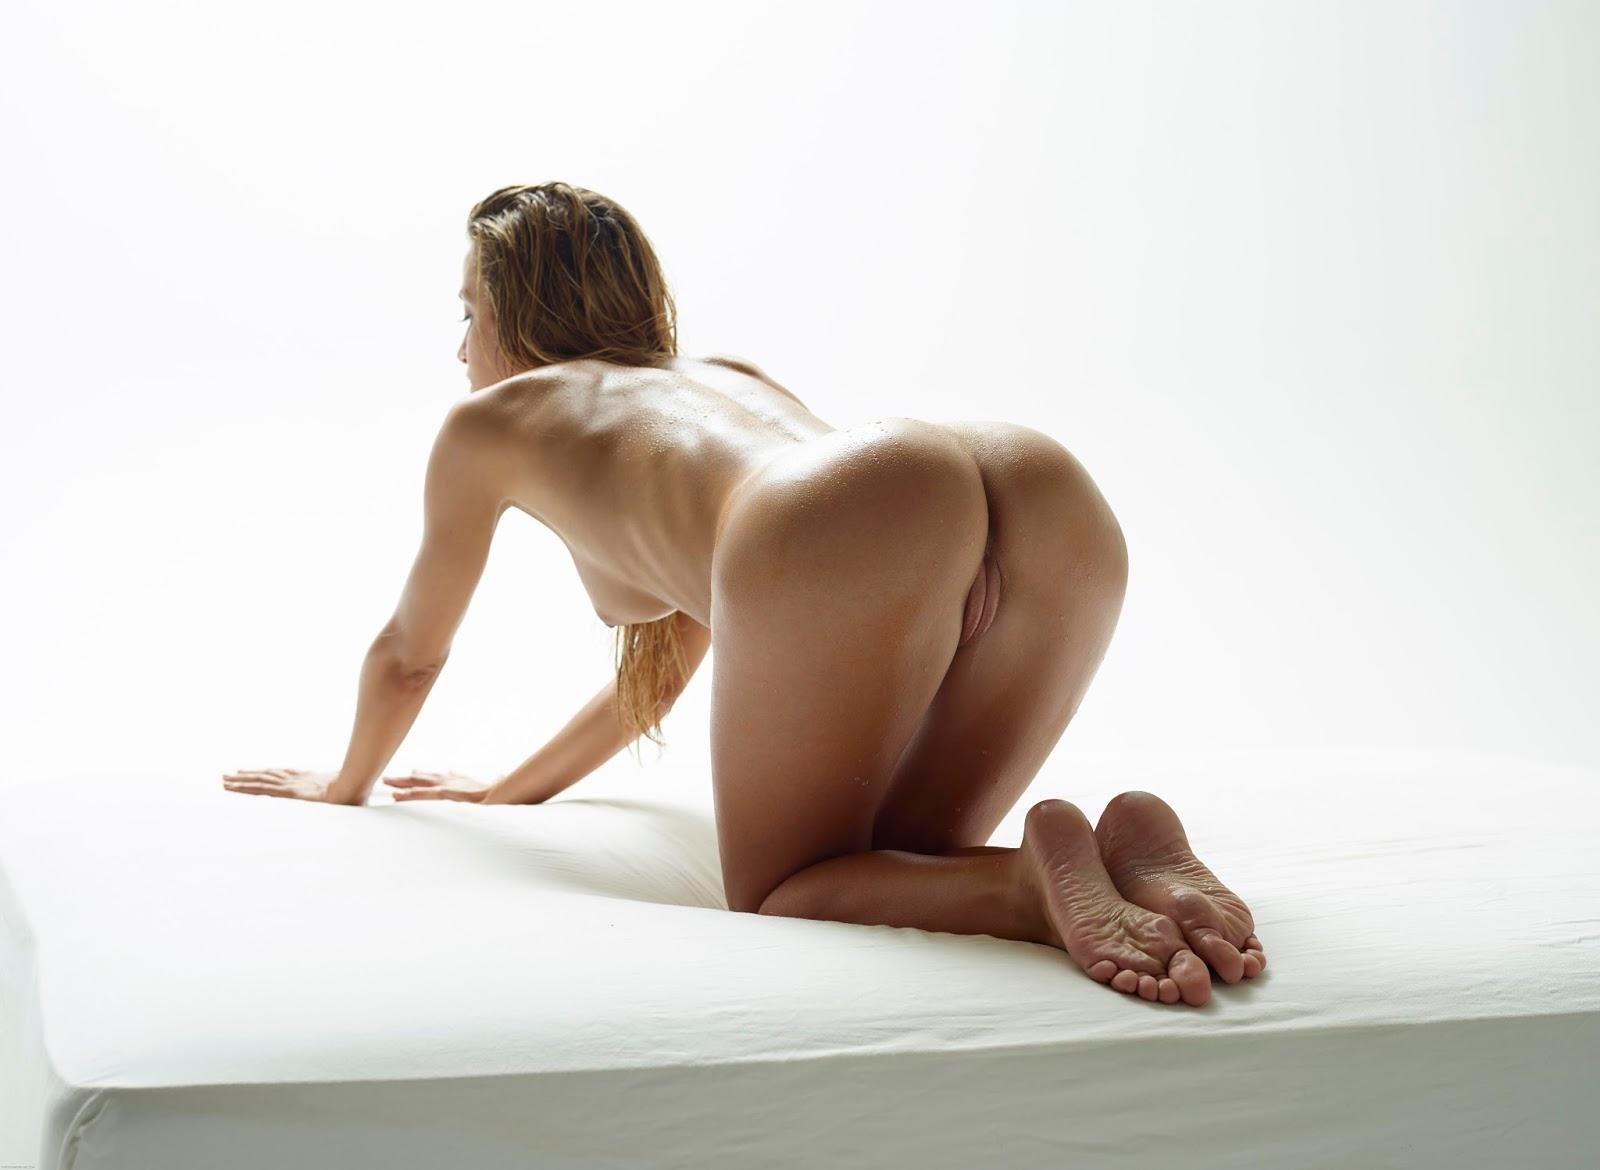 full naced sexy girl image